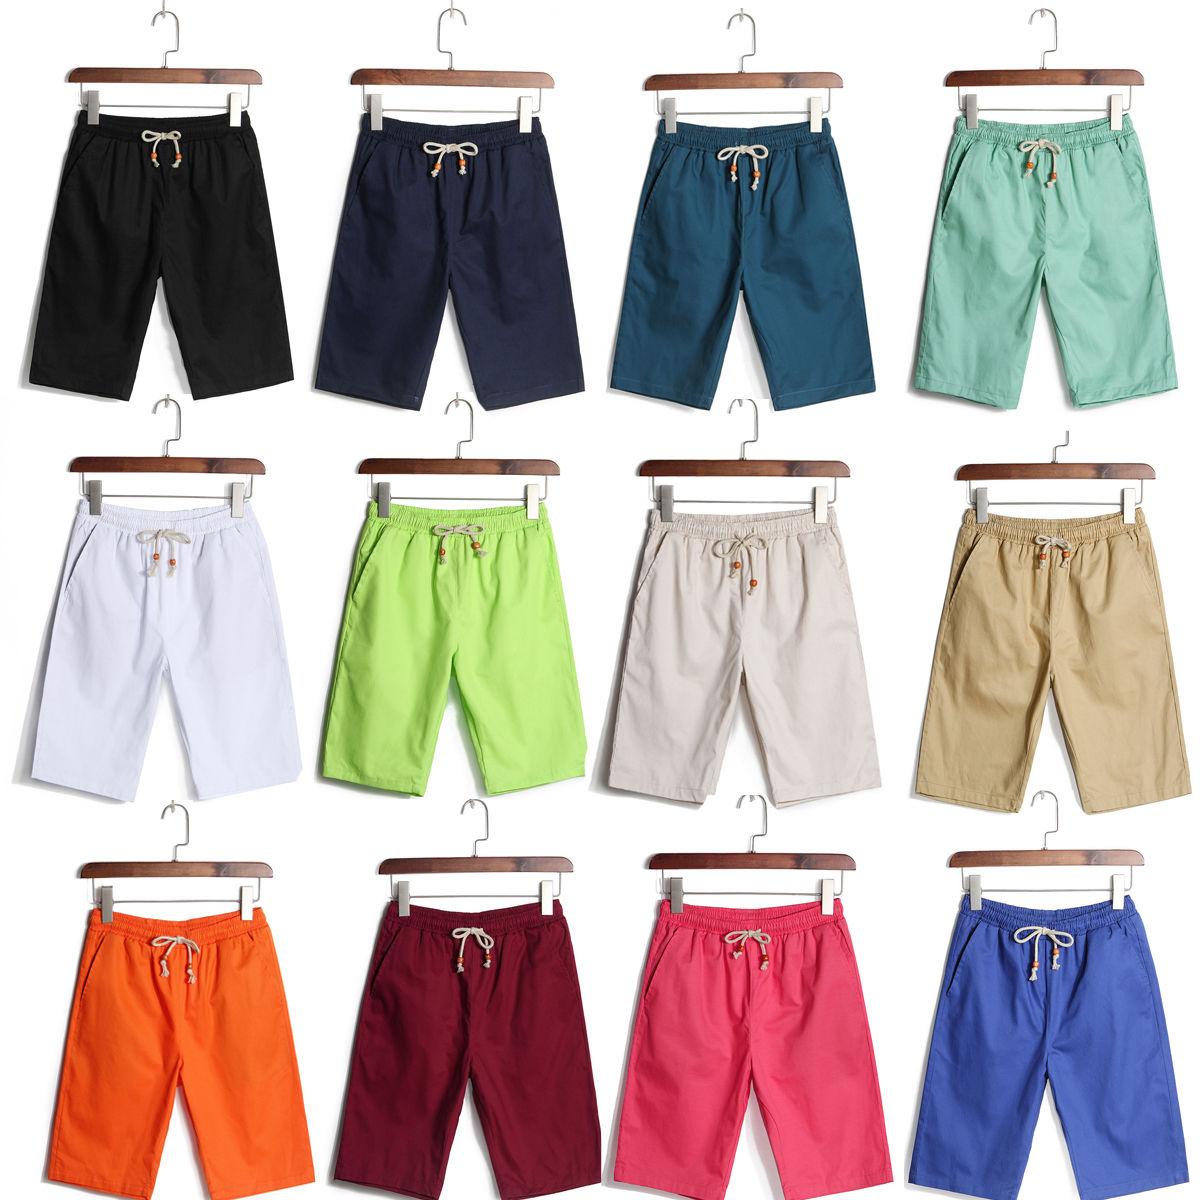 Outdoor Sports Plain Men Boy   Board   Surf Swimming Swim Beach   Shorts   Trunks Pants Holiday sport leisure